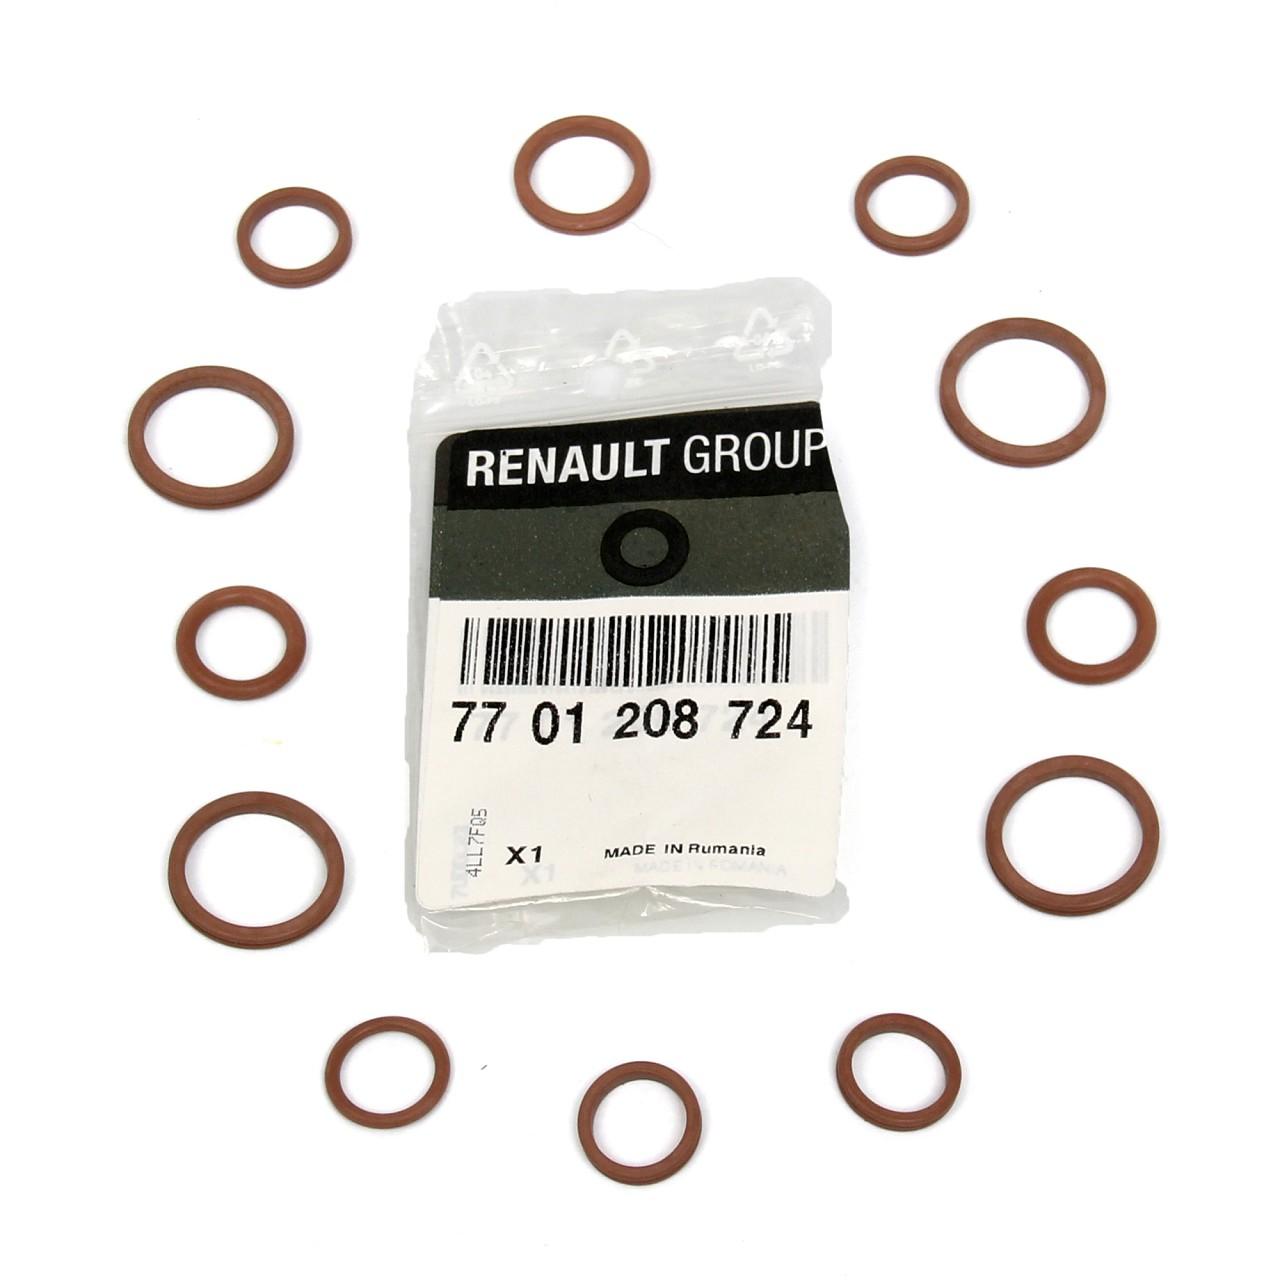 ORIGINAL Renault Dichtringsatz Klimaanlage Espace IV Laguna II 7701208724